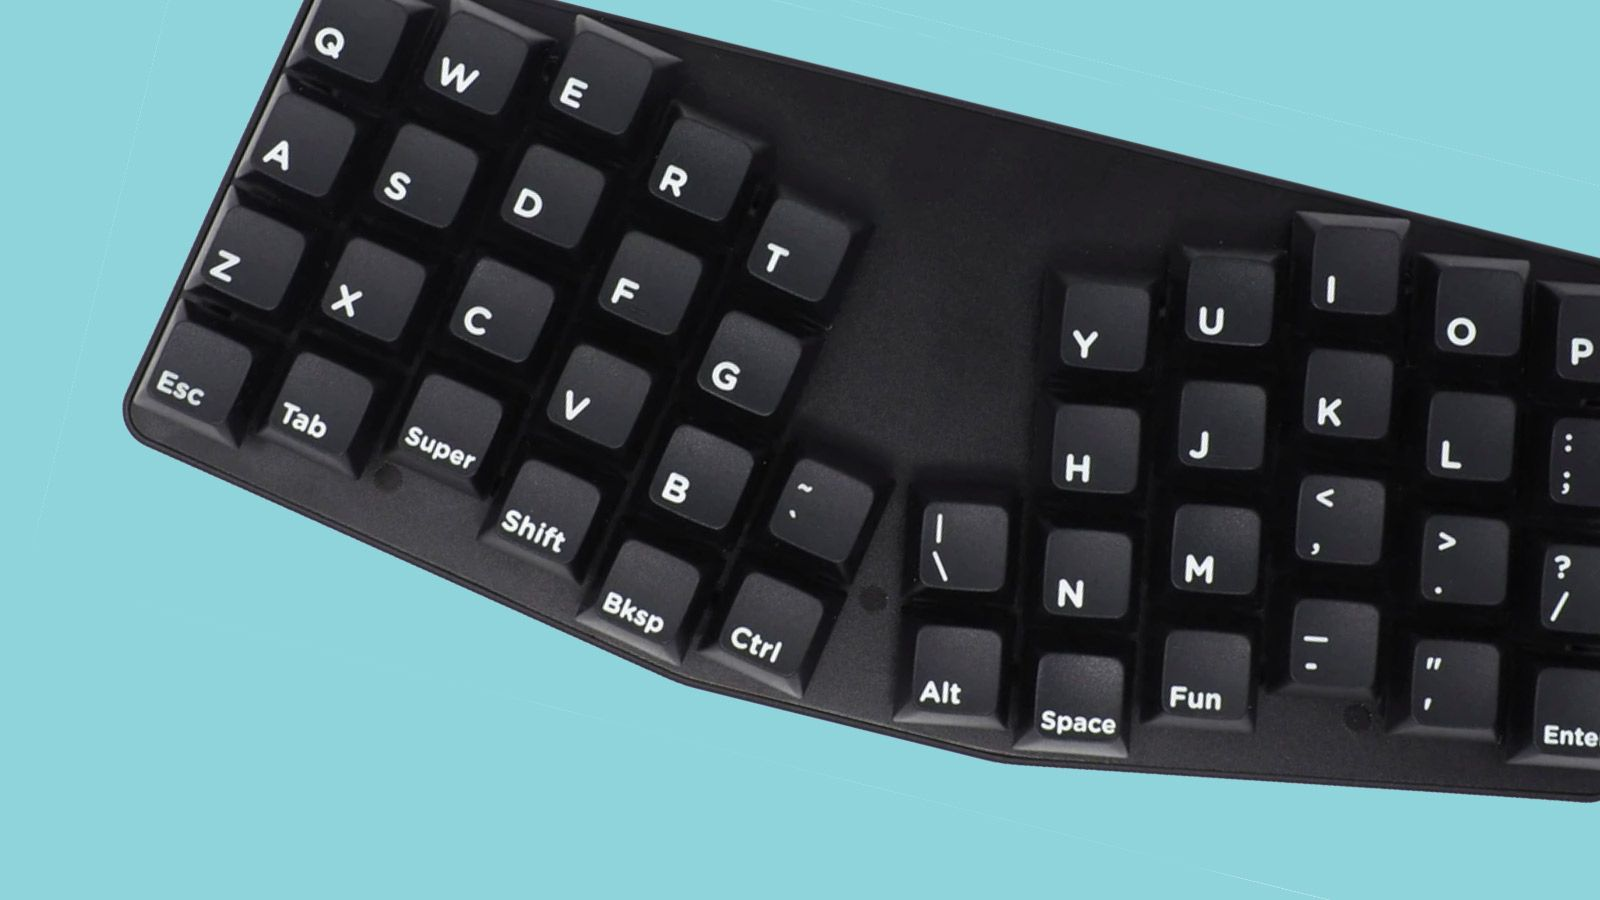 Keyboardio: A Developer's Journey to Crowdfunding Success